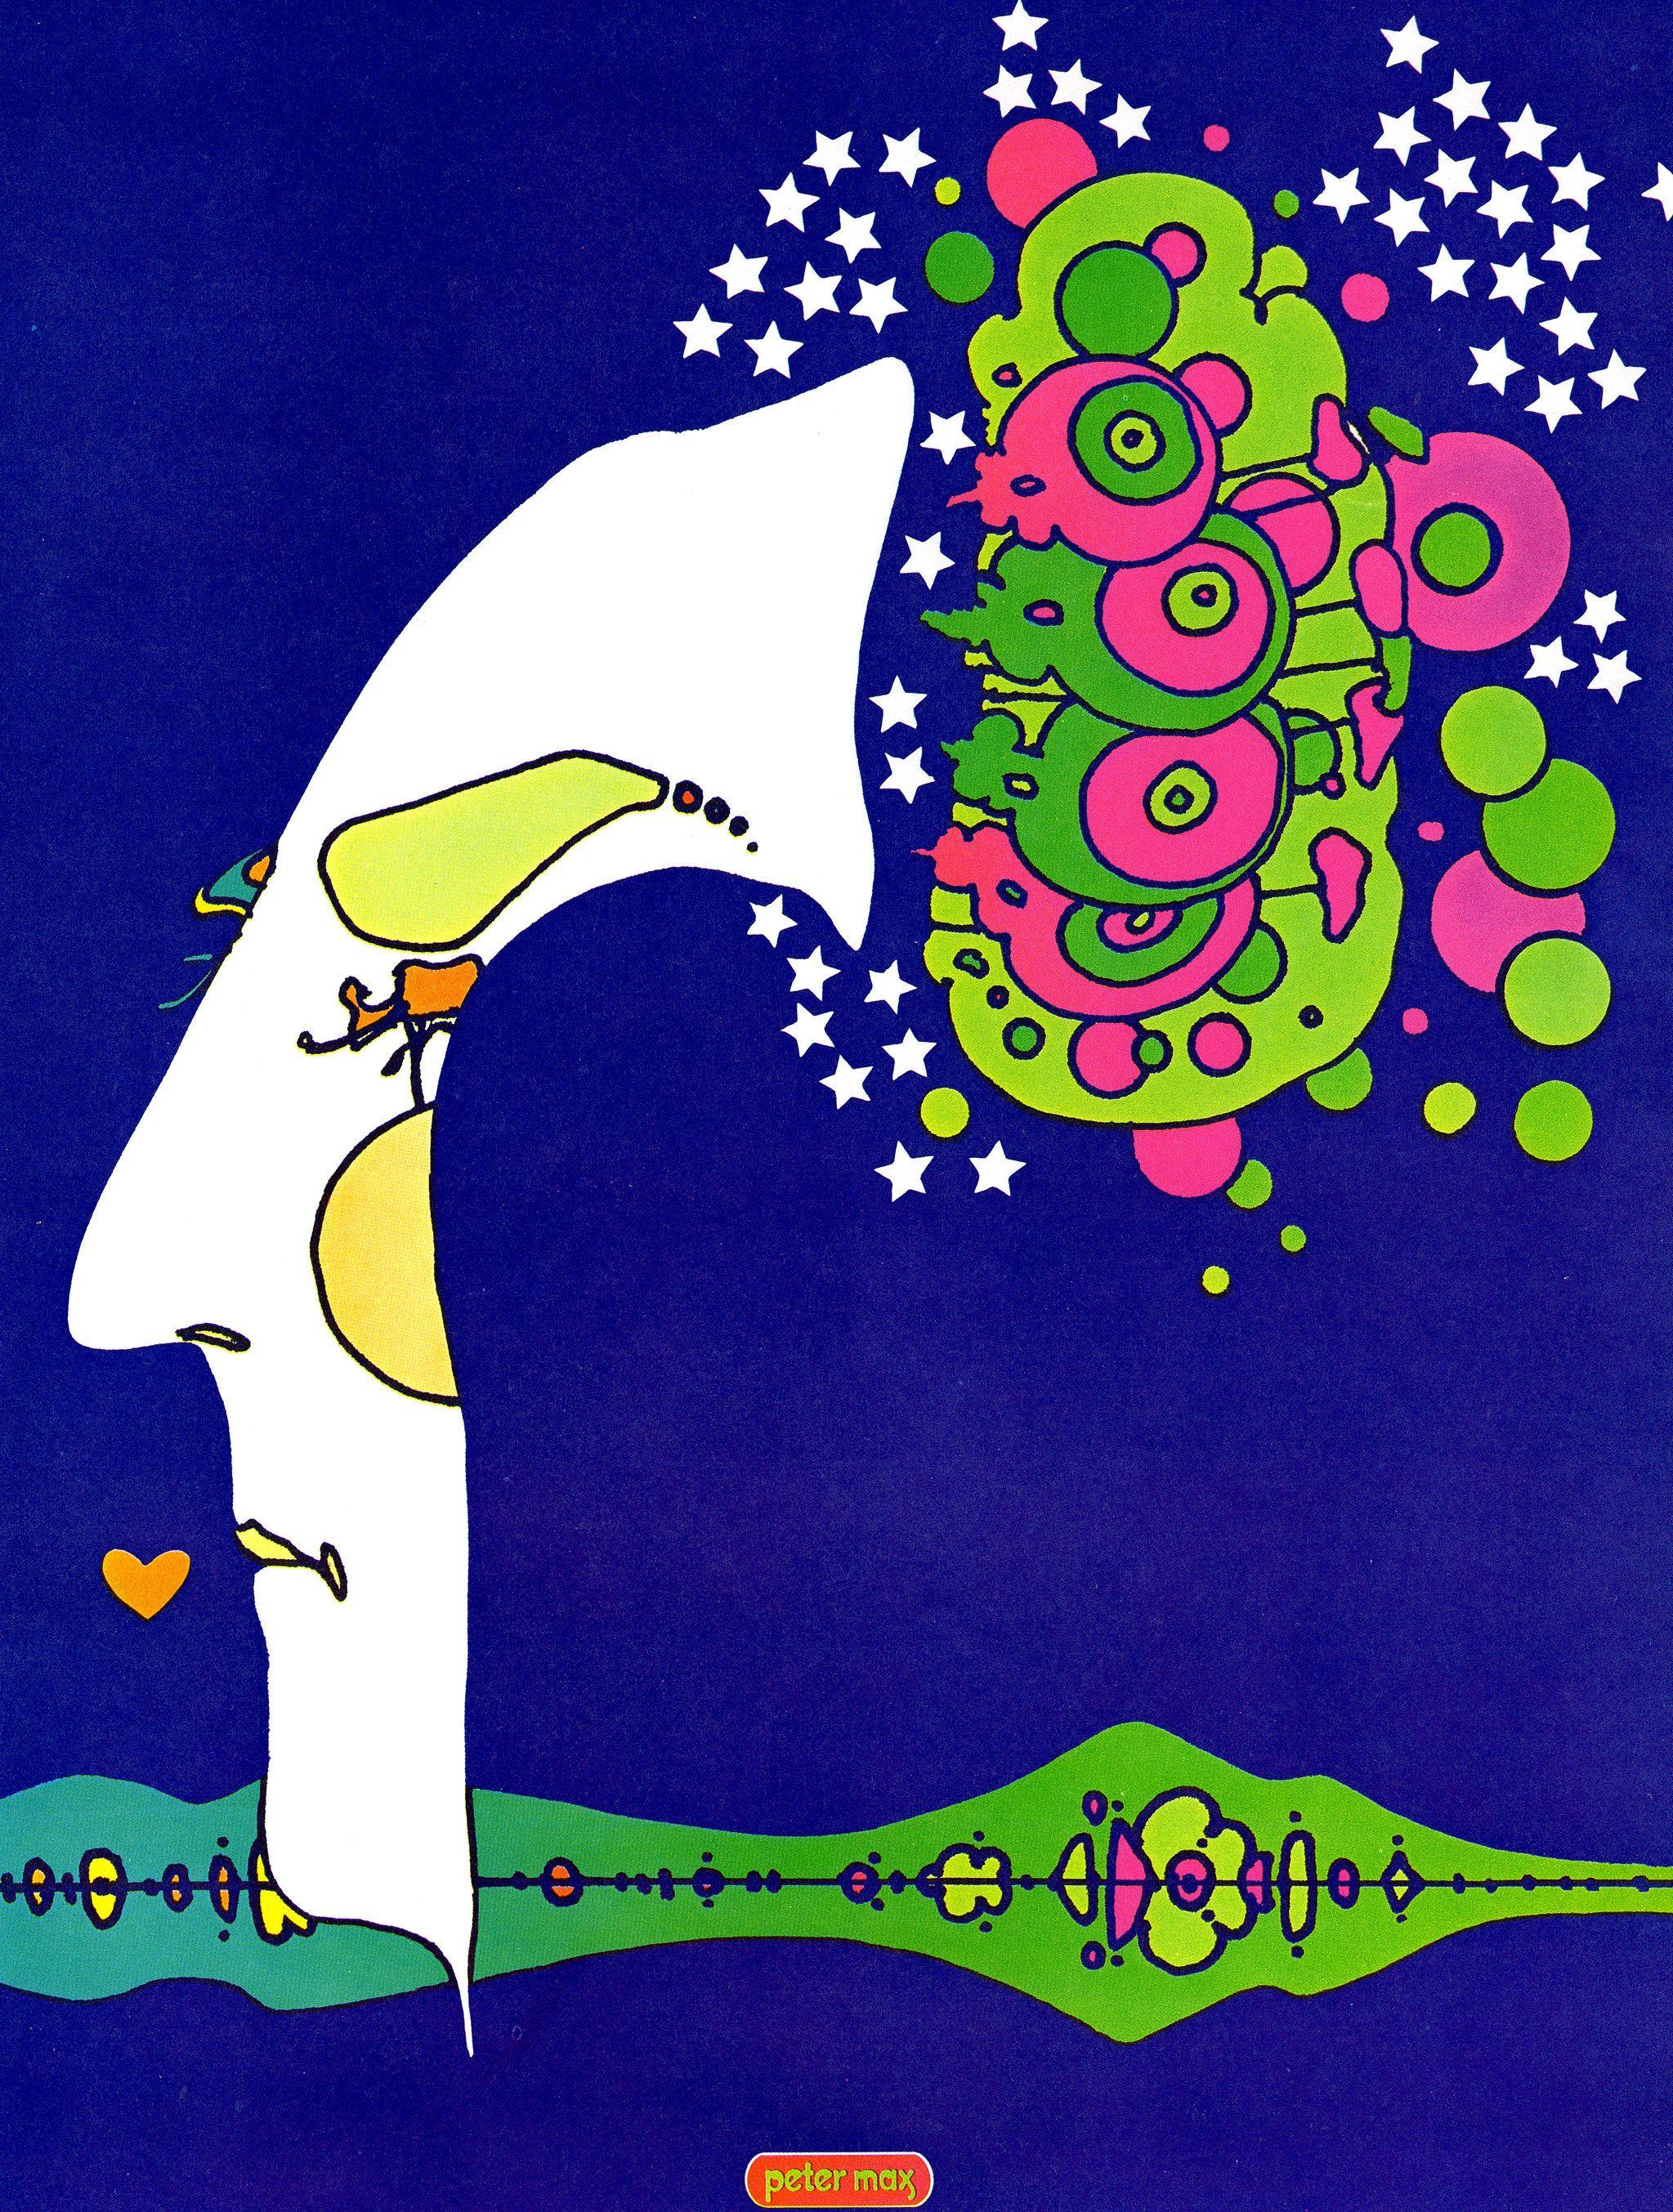 Peter max midnight dream poster vintage 1970 pop art